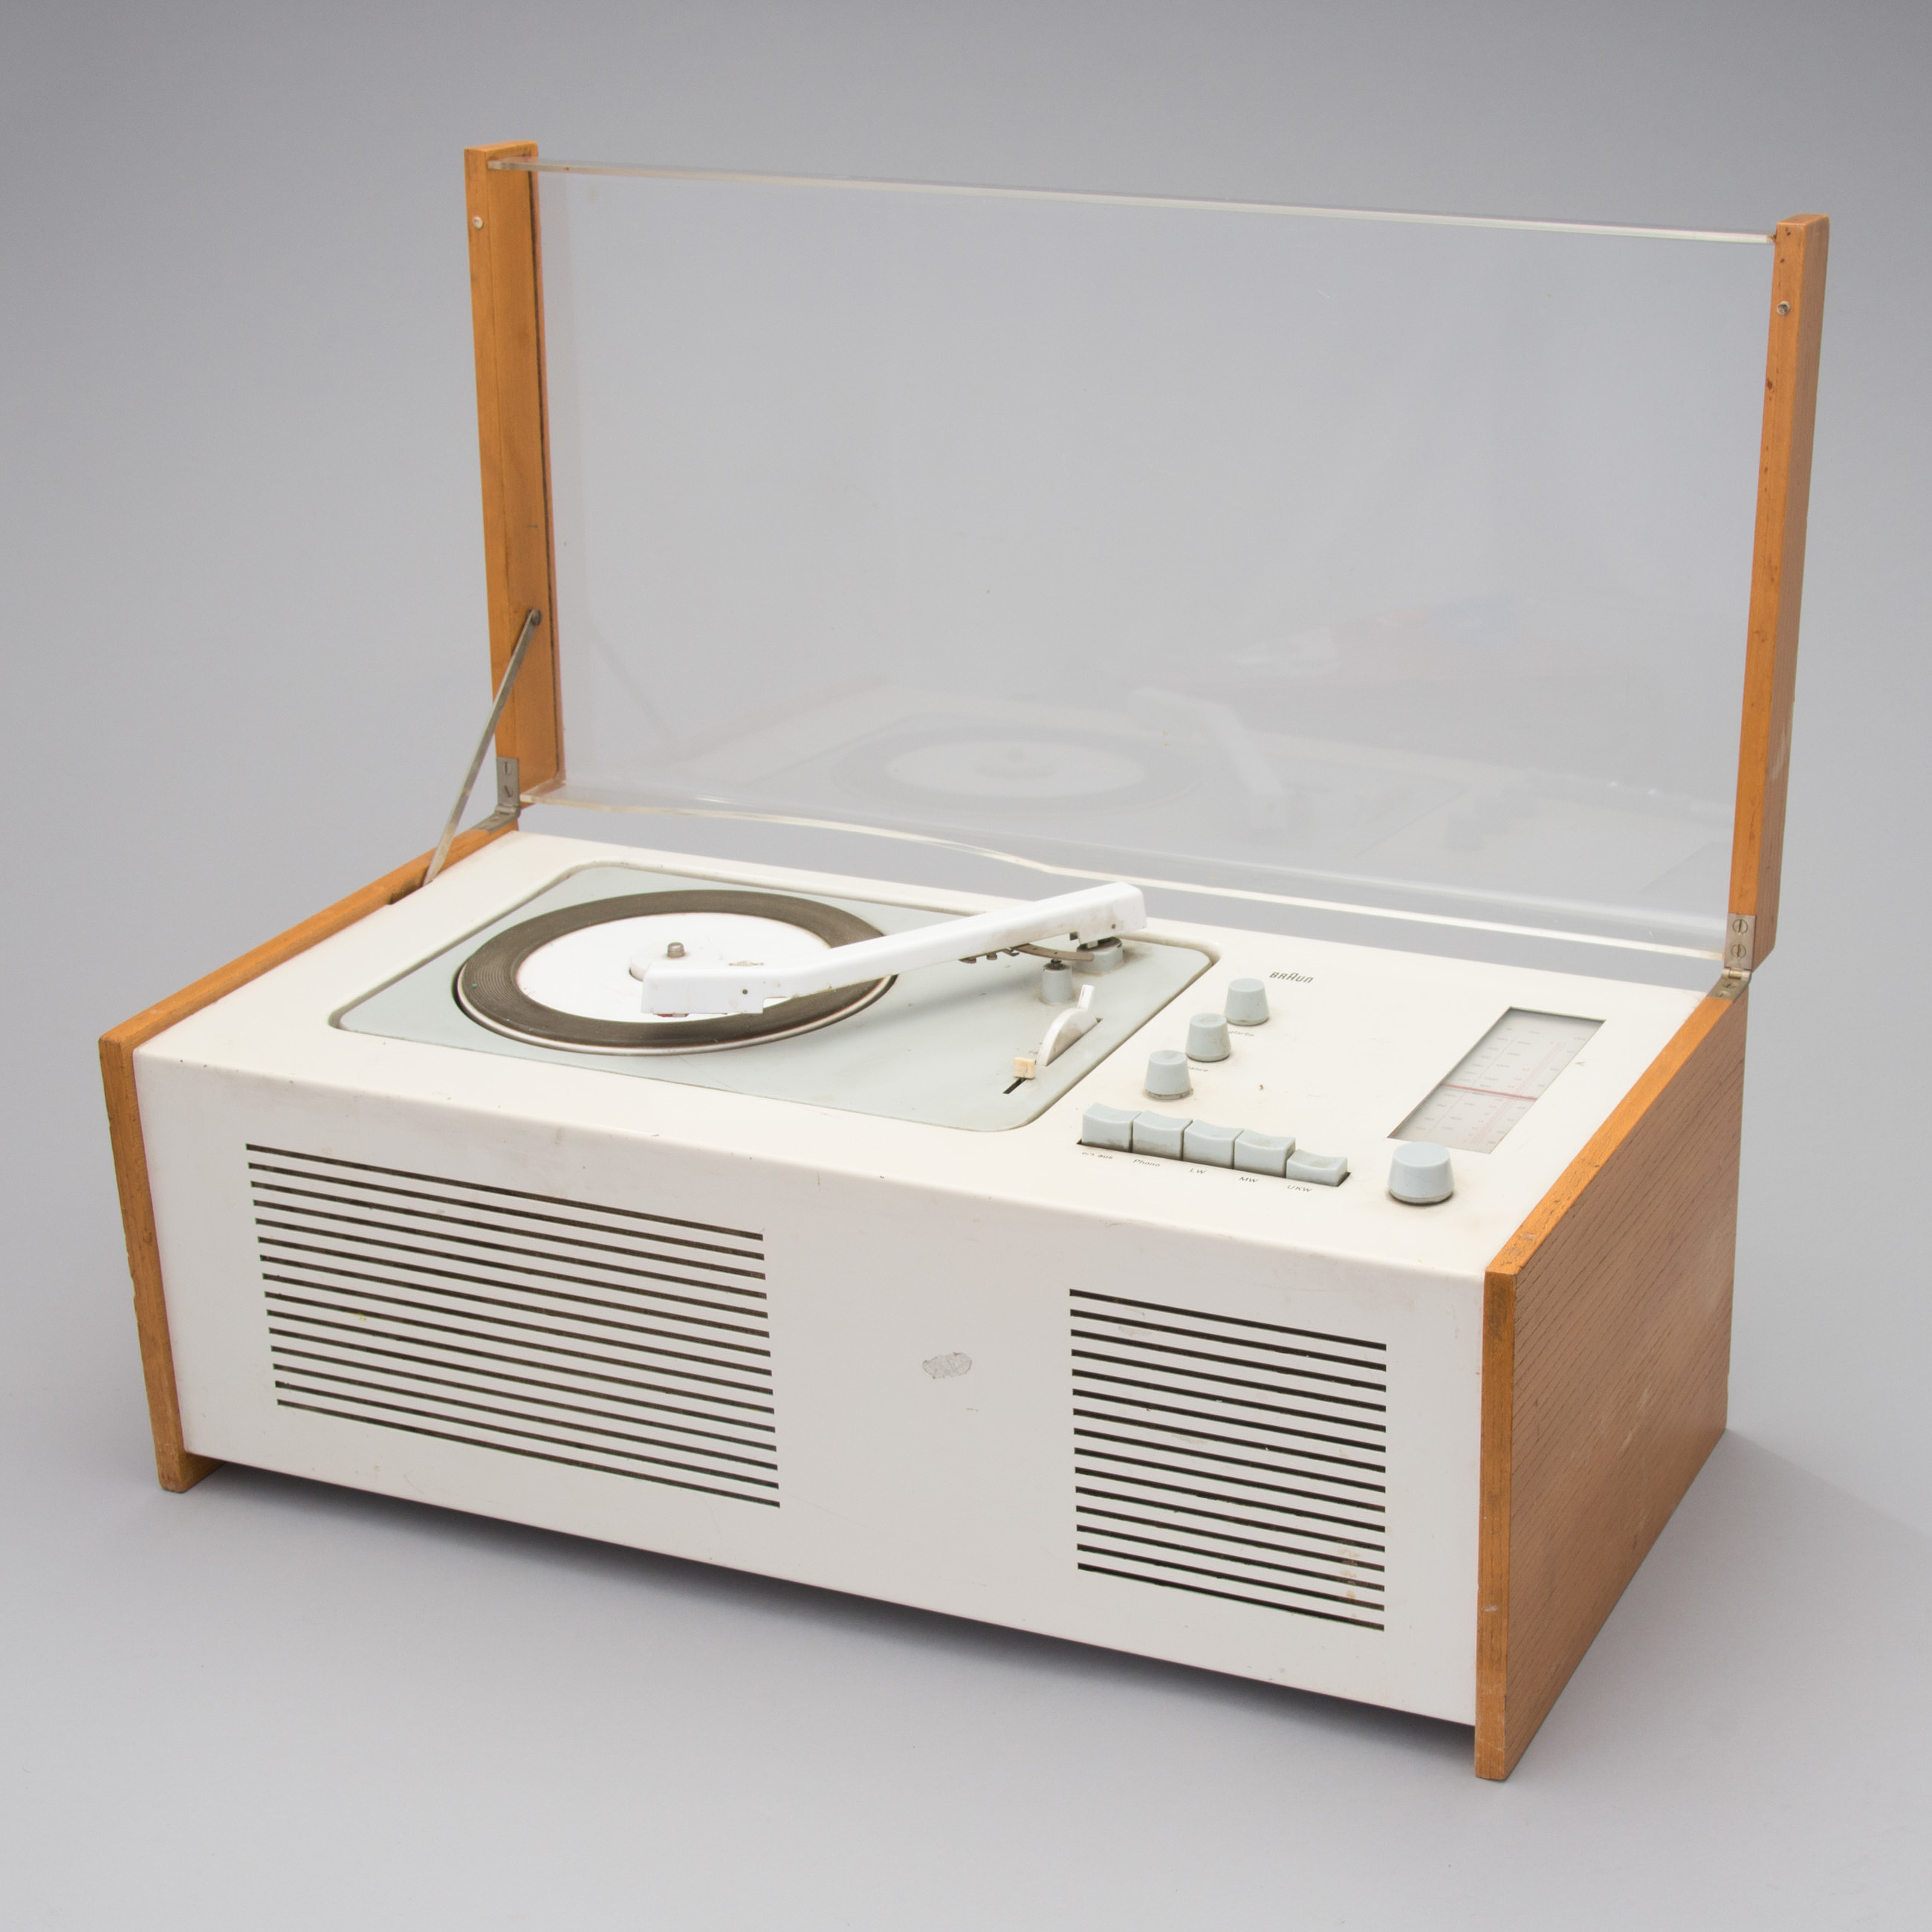 radio levysoitin sk 61 dieter rams ja hans gugelot braun saksa 1960 luku bukowskis. Black Bedroom Furniture Sets. Home Design Ideas